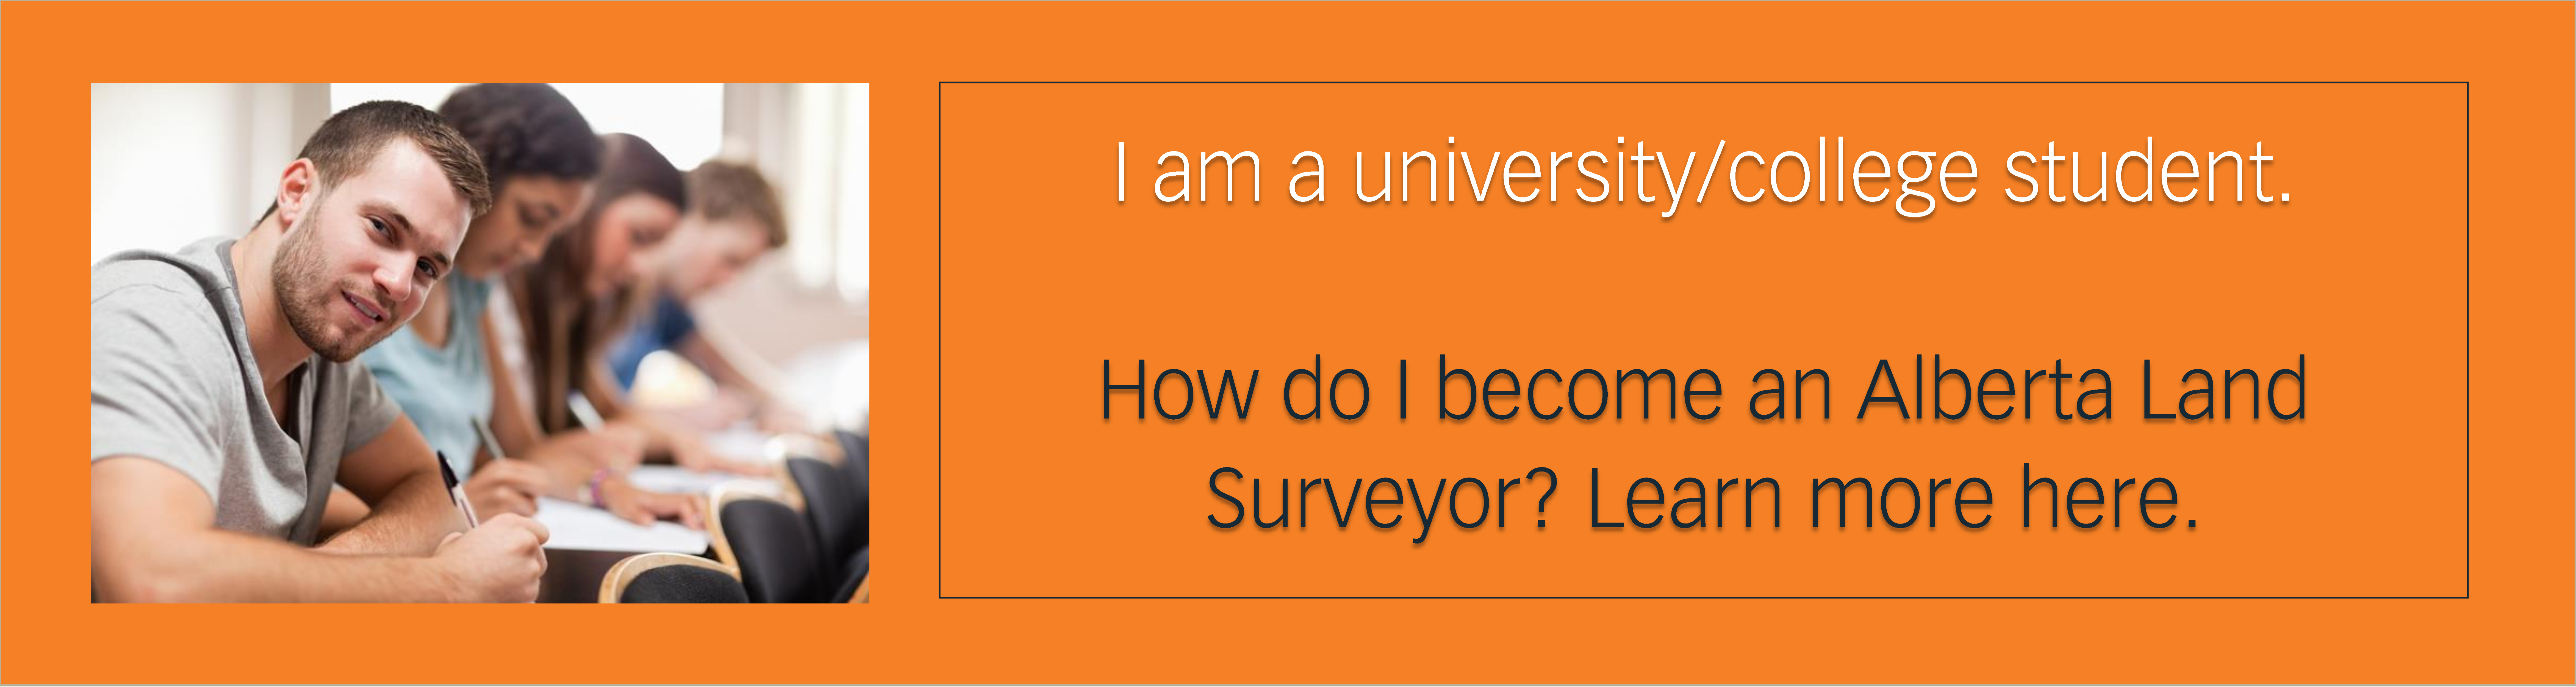 College/University Student